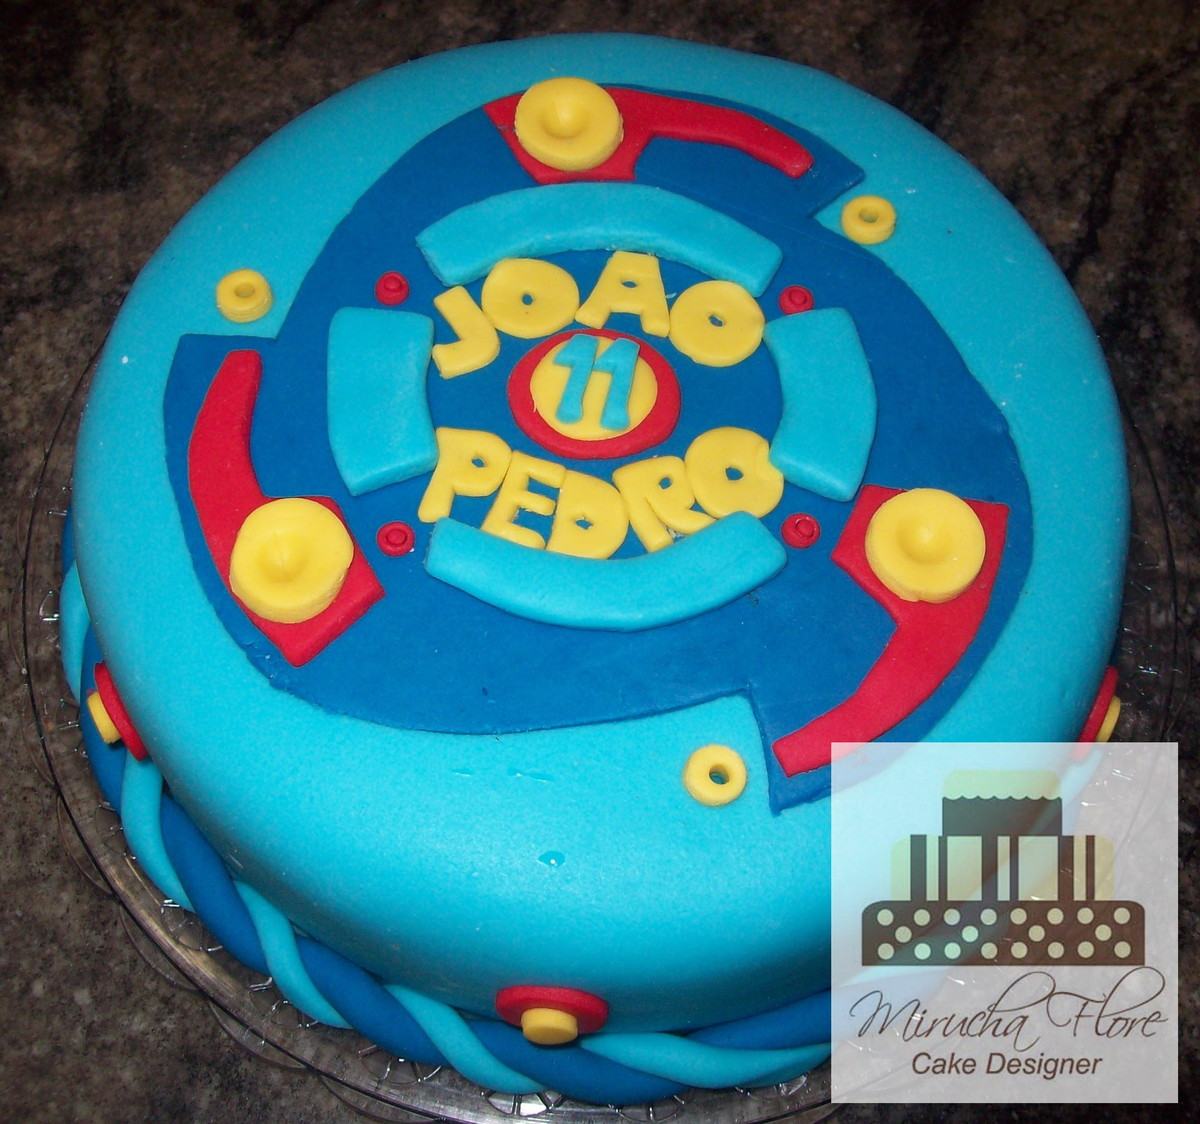 Bolo Beyblade No Elo7 Atelier Mirucha Flore Cake